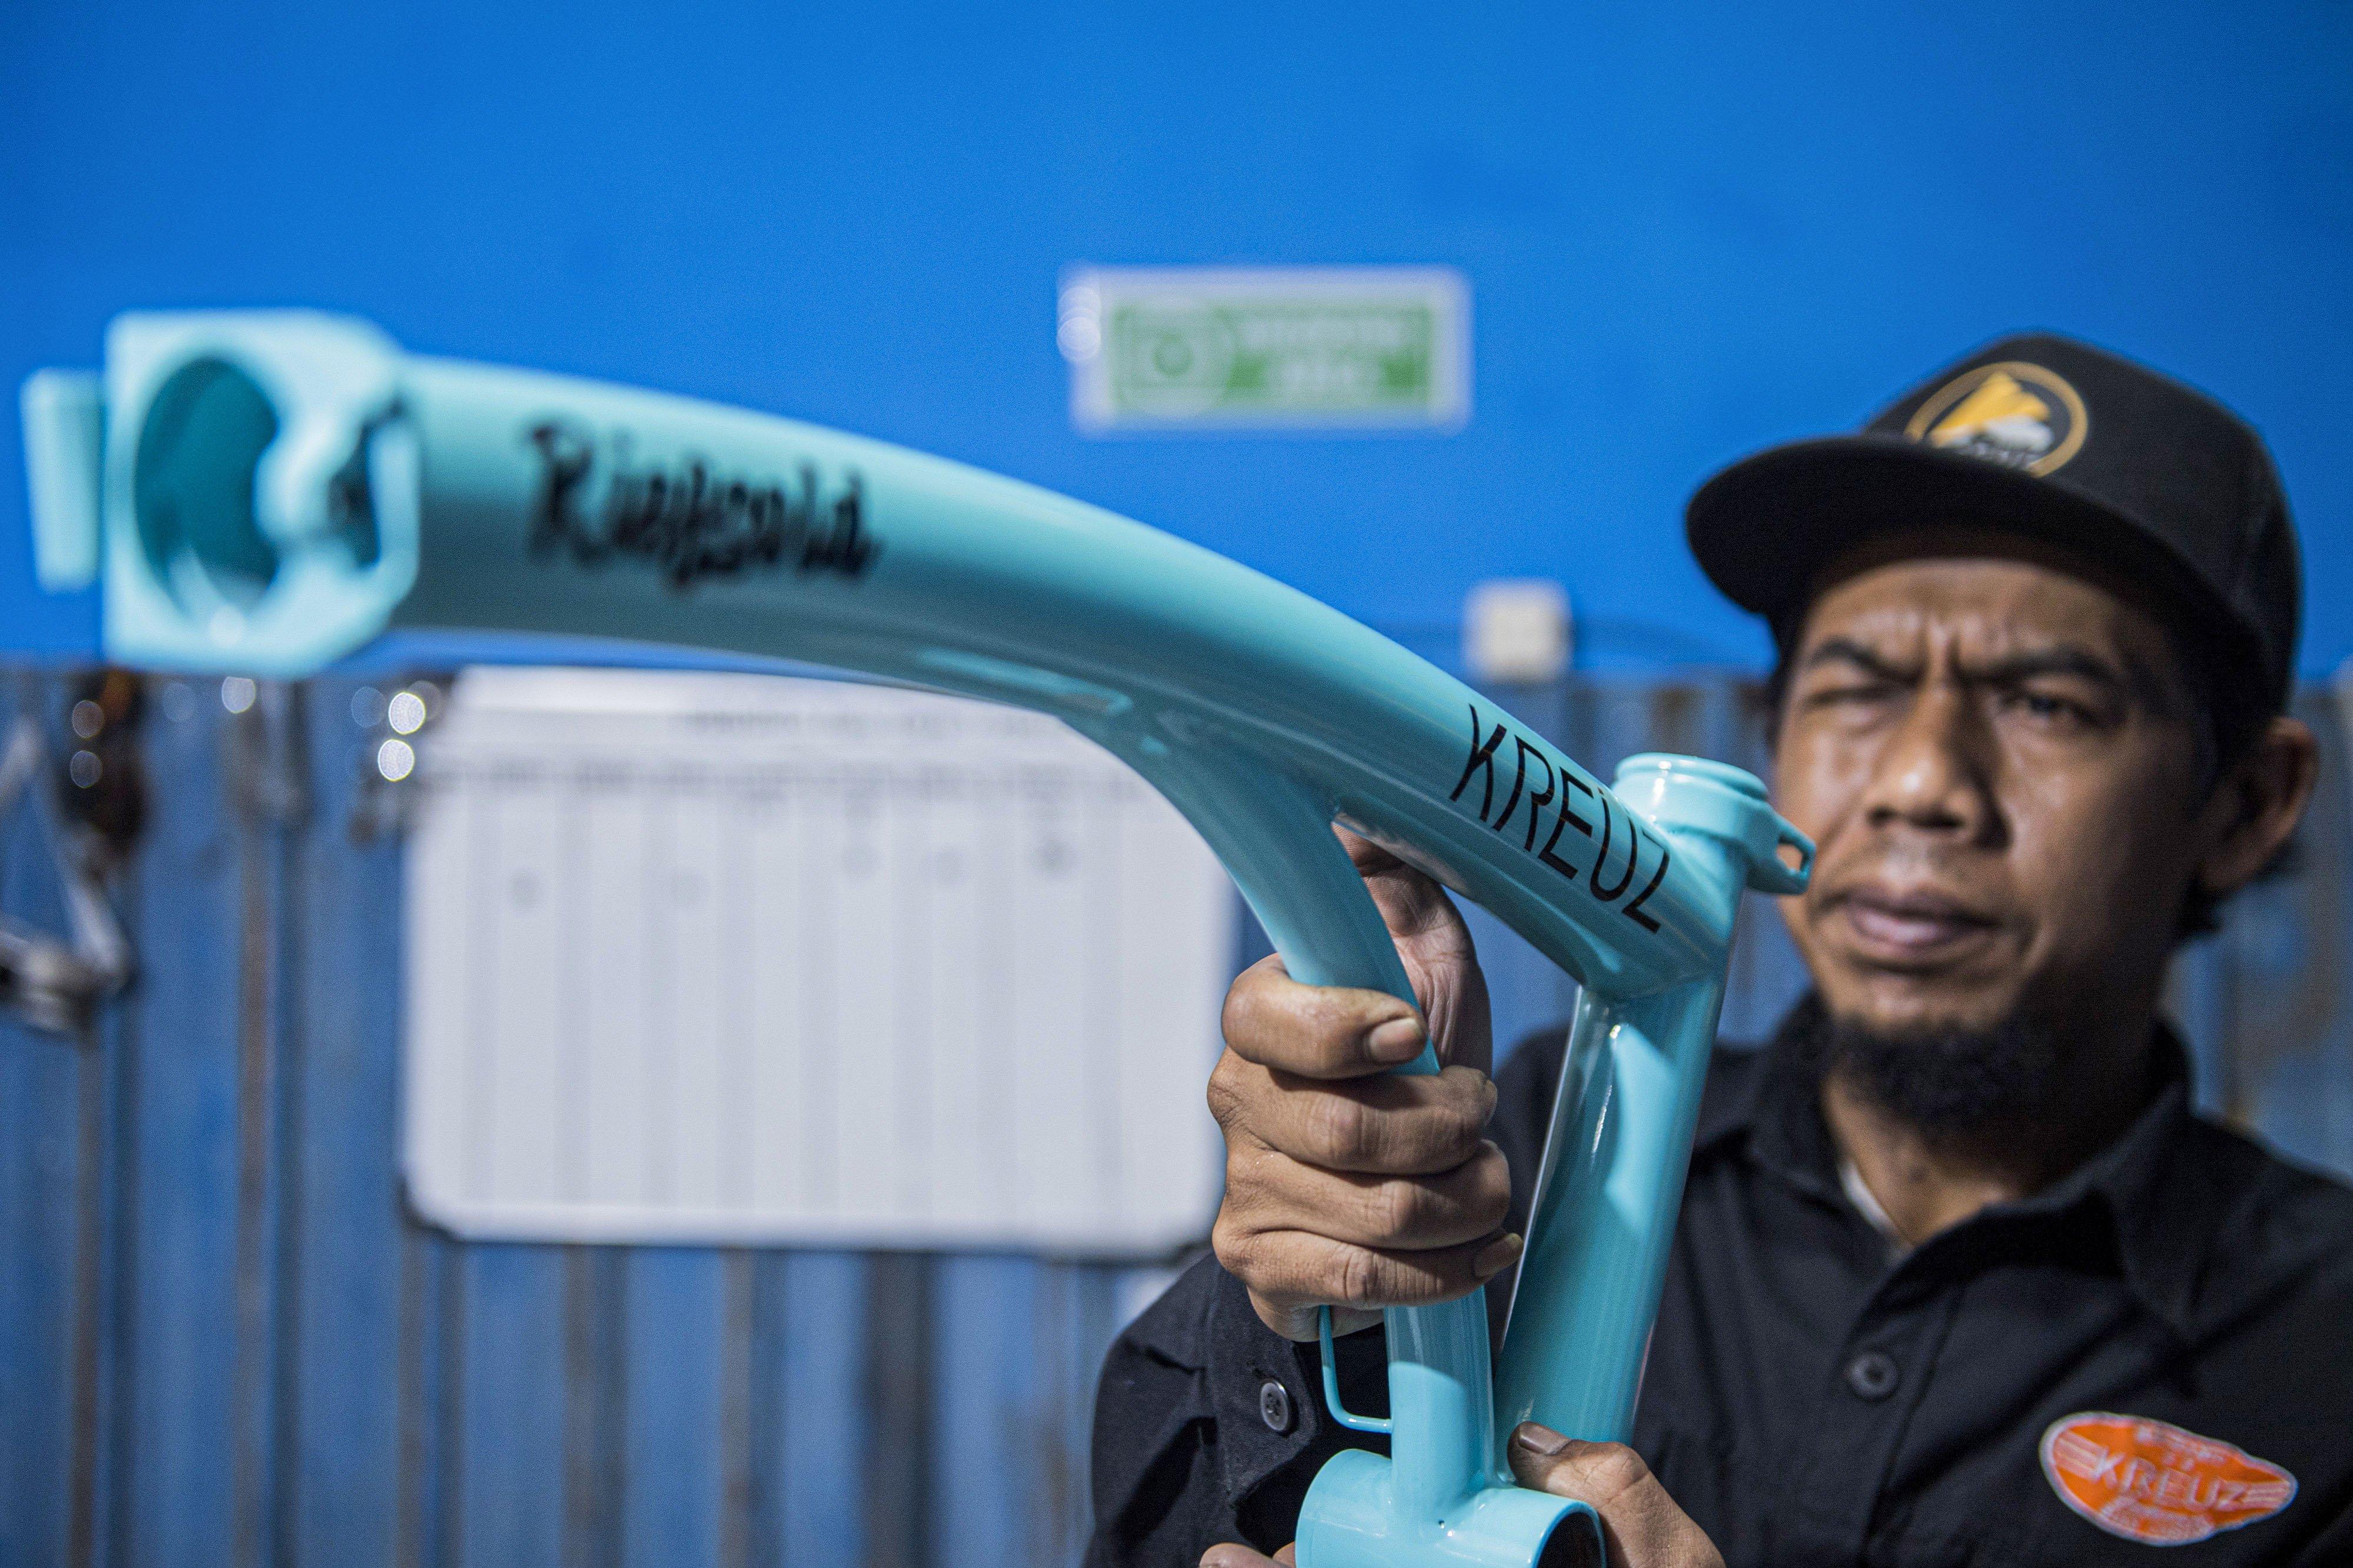 Pekerja mengukur rangka (main frame) sepeda lipat Kreuz di Bandung, Jawa Barat, Sabtu (21/11/2020).